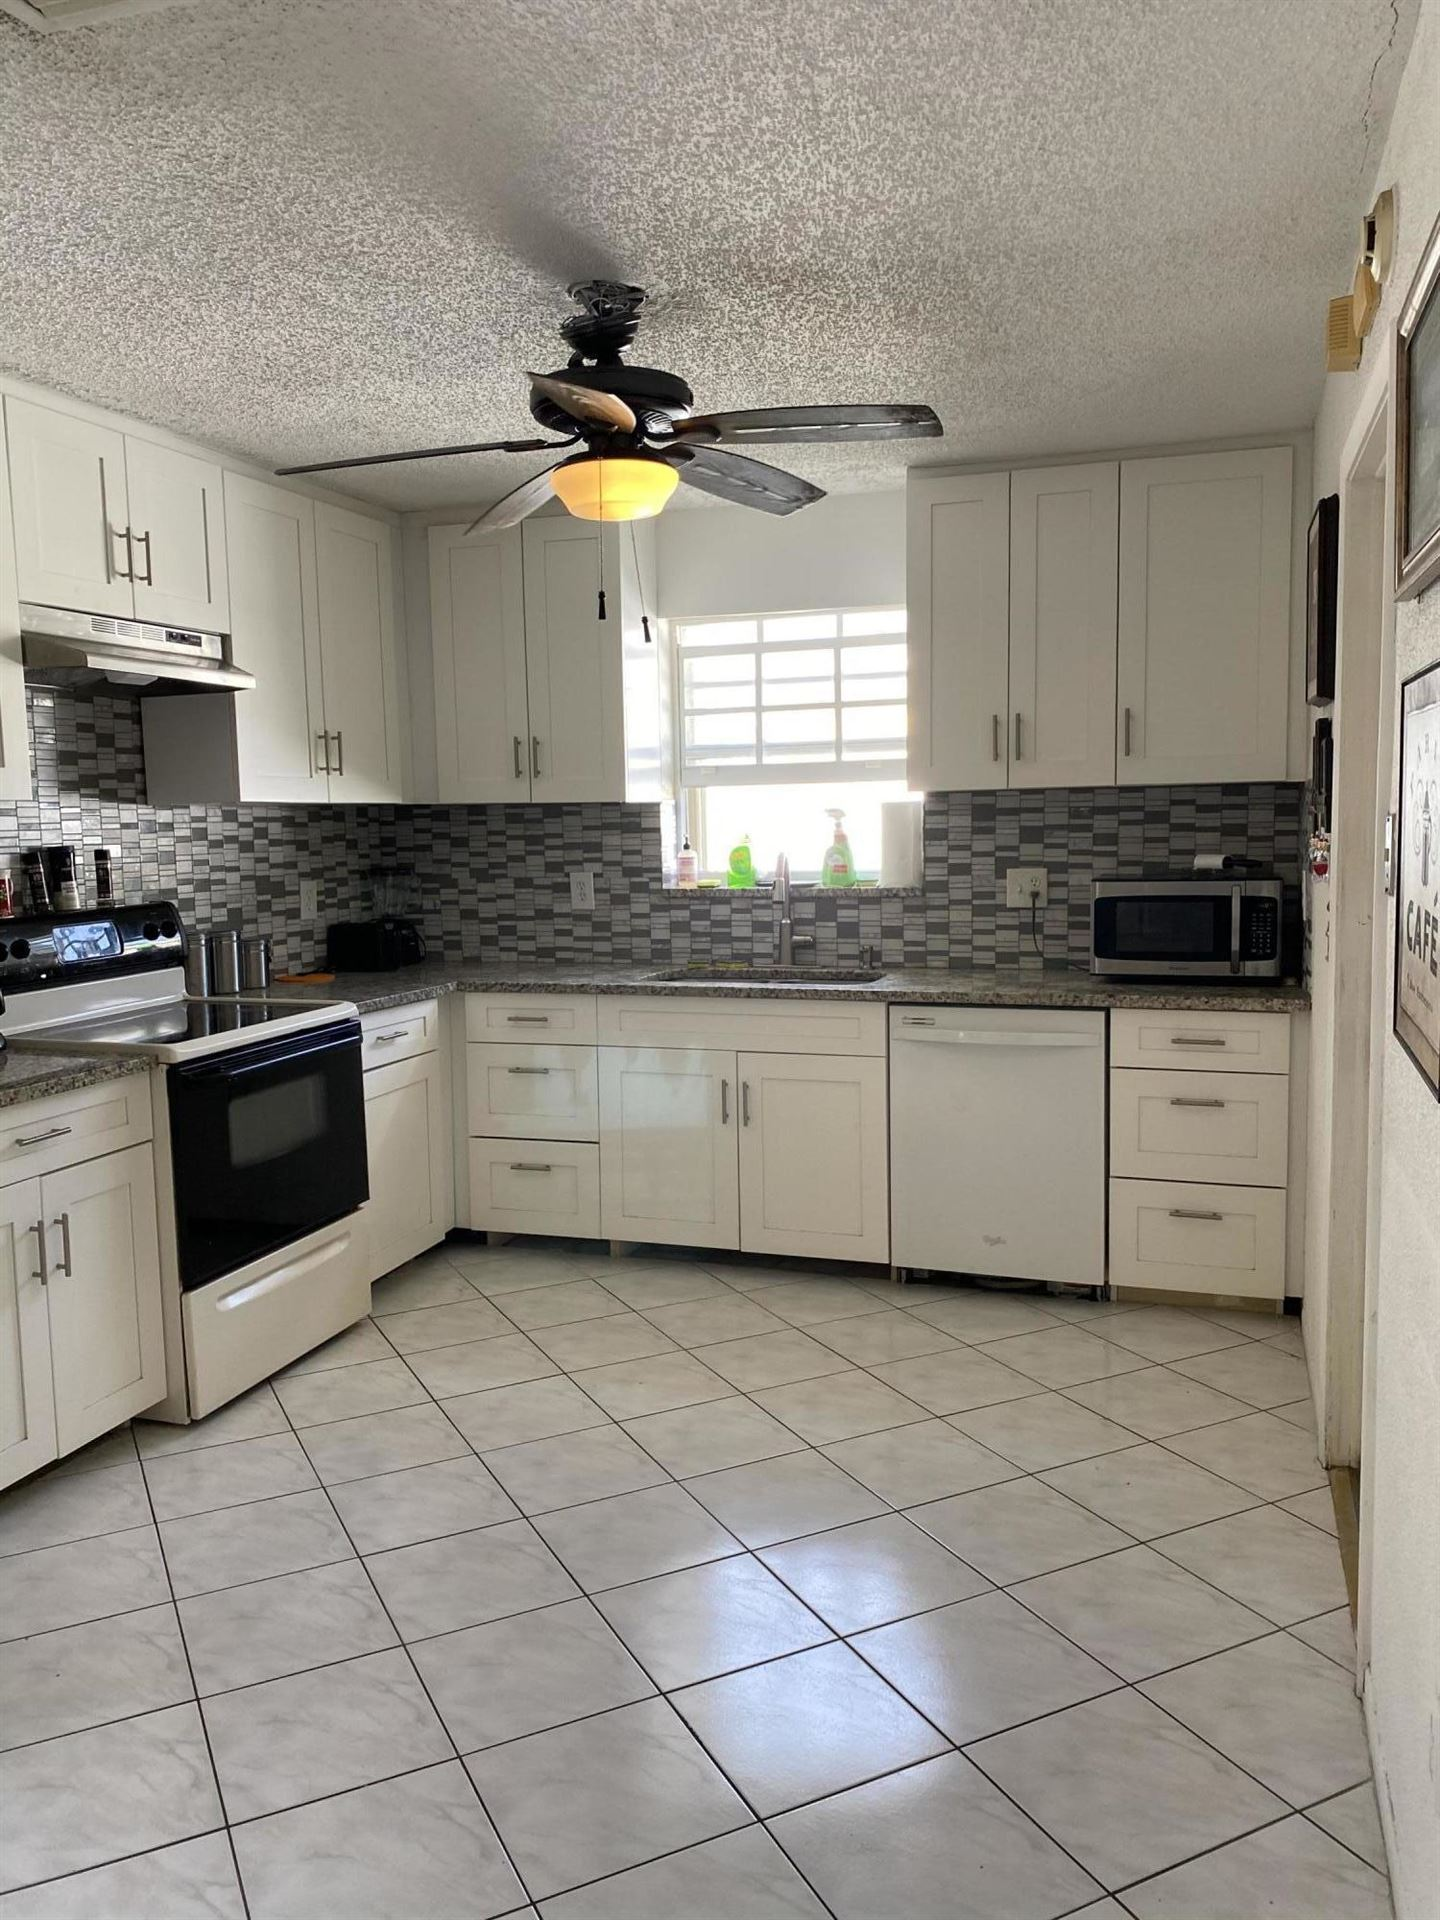 Photo of 22335 Boulder Street, Boca Raton, FL 33428 (MLS # RX-10685783)